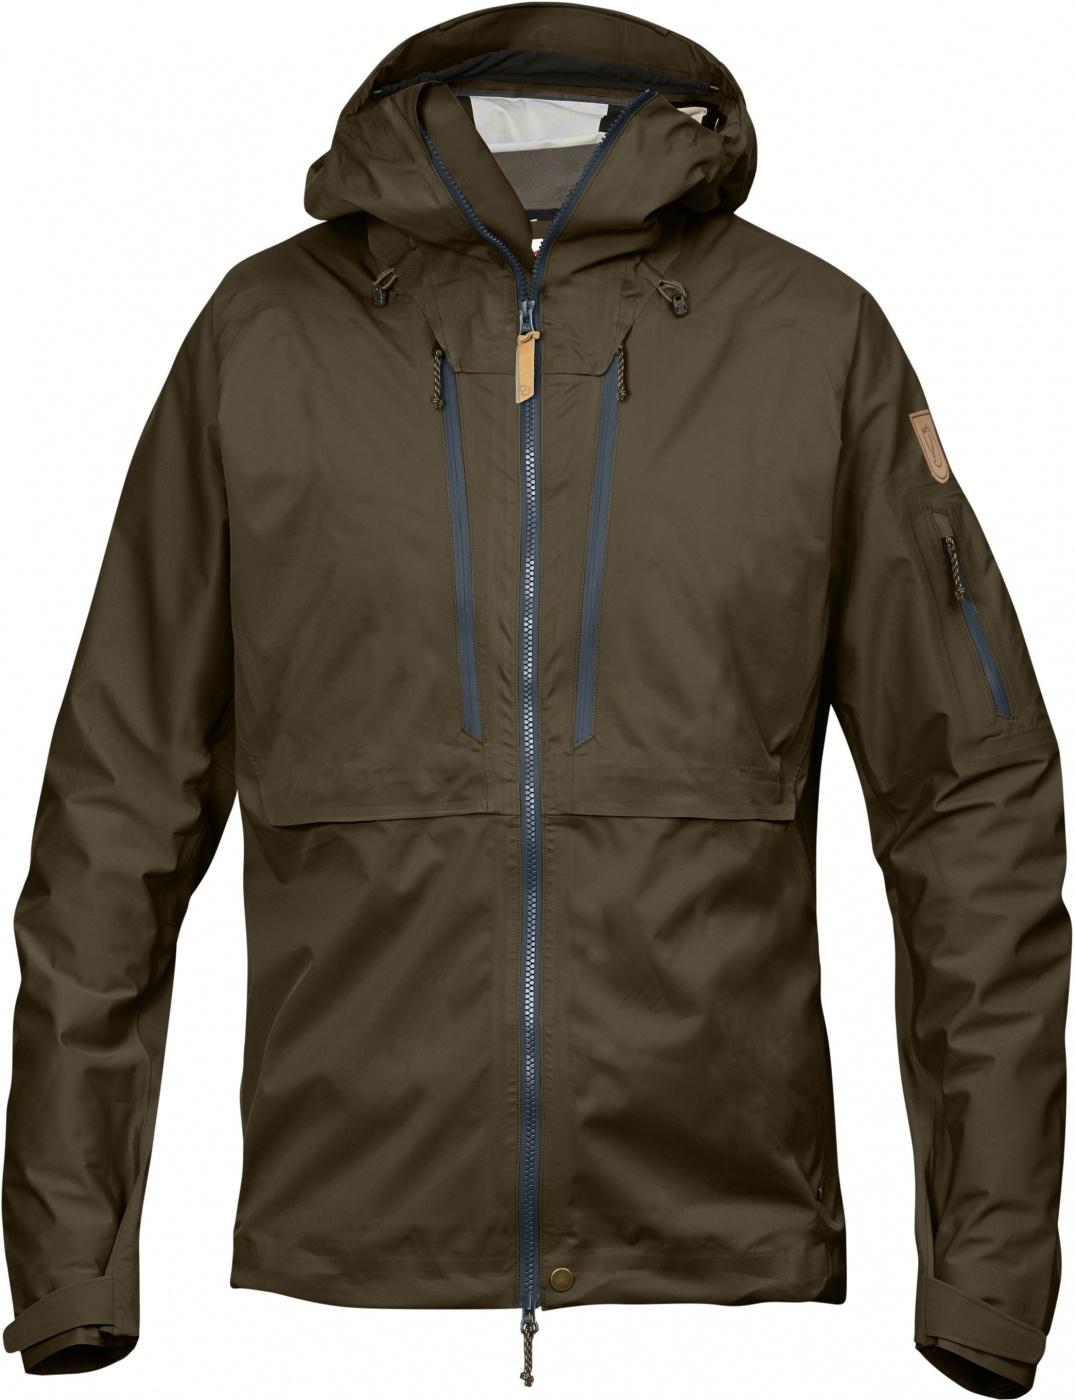 FjallRaven Keb Eco-Shell Jacket Khaki-30